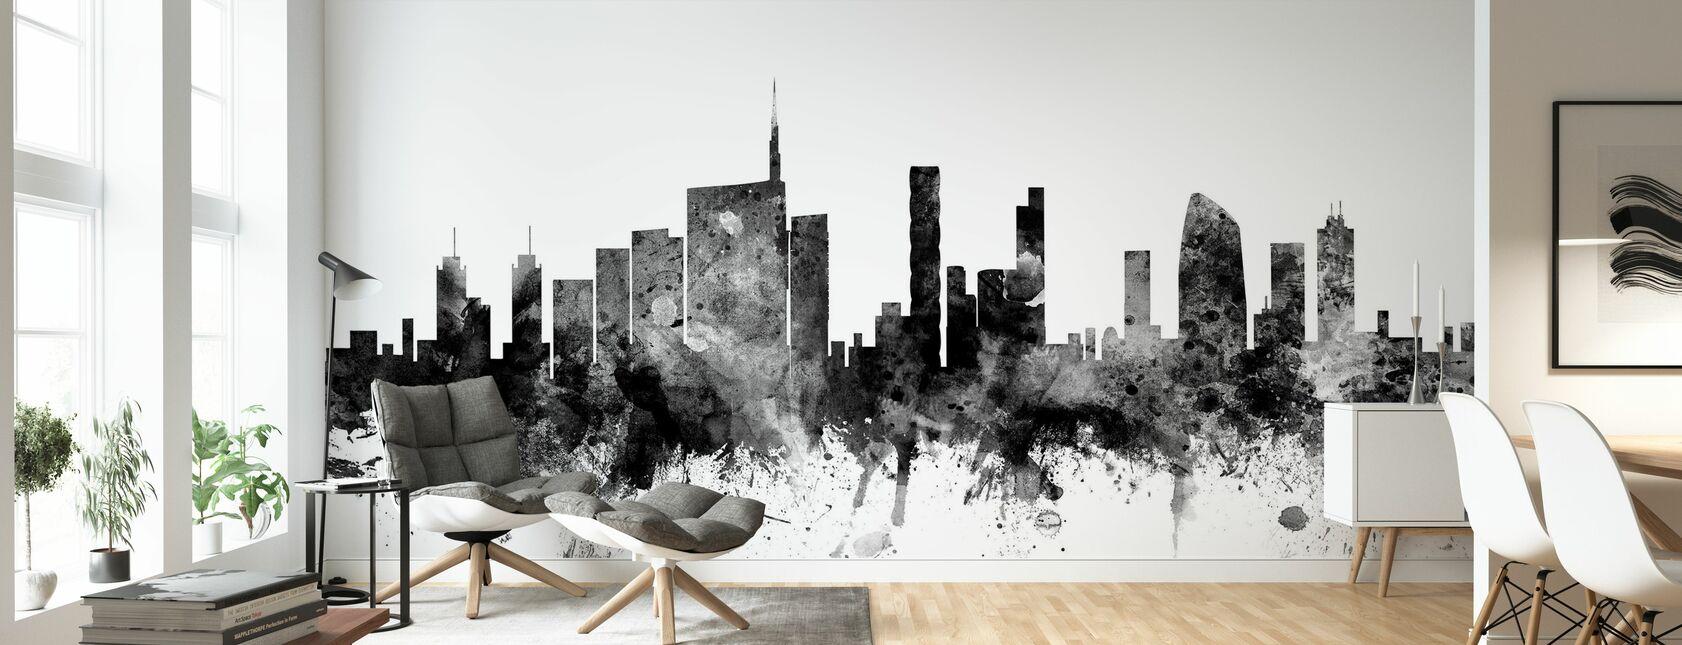 Milan Skyline Noir - Papier peint - Salle à manger